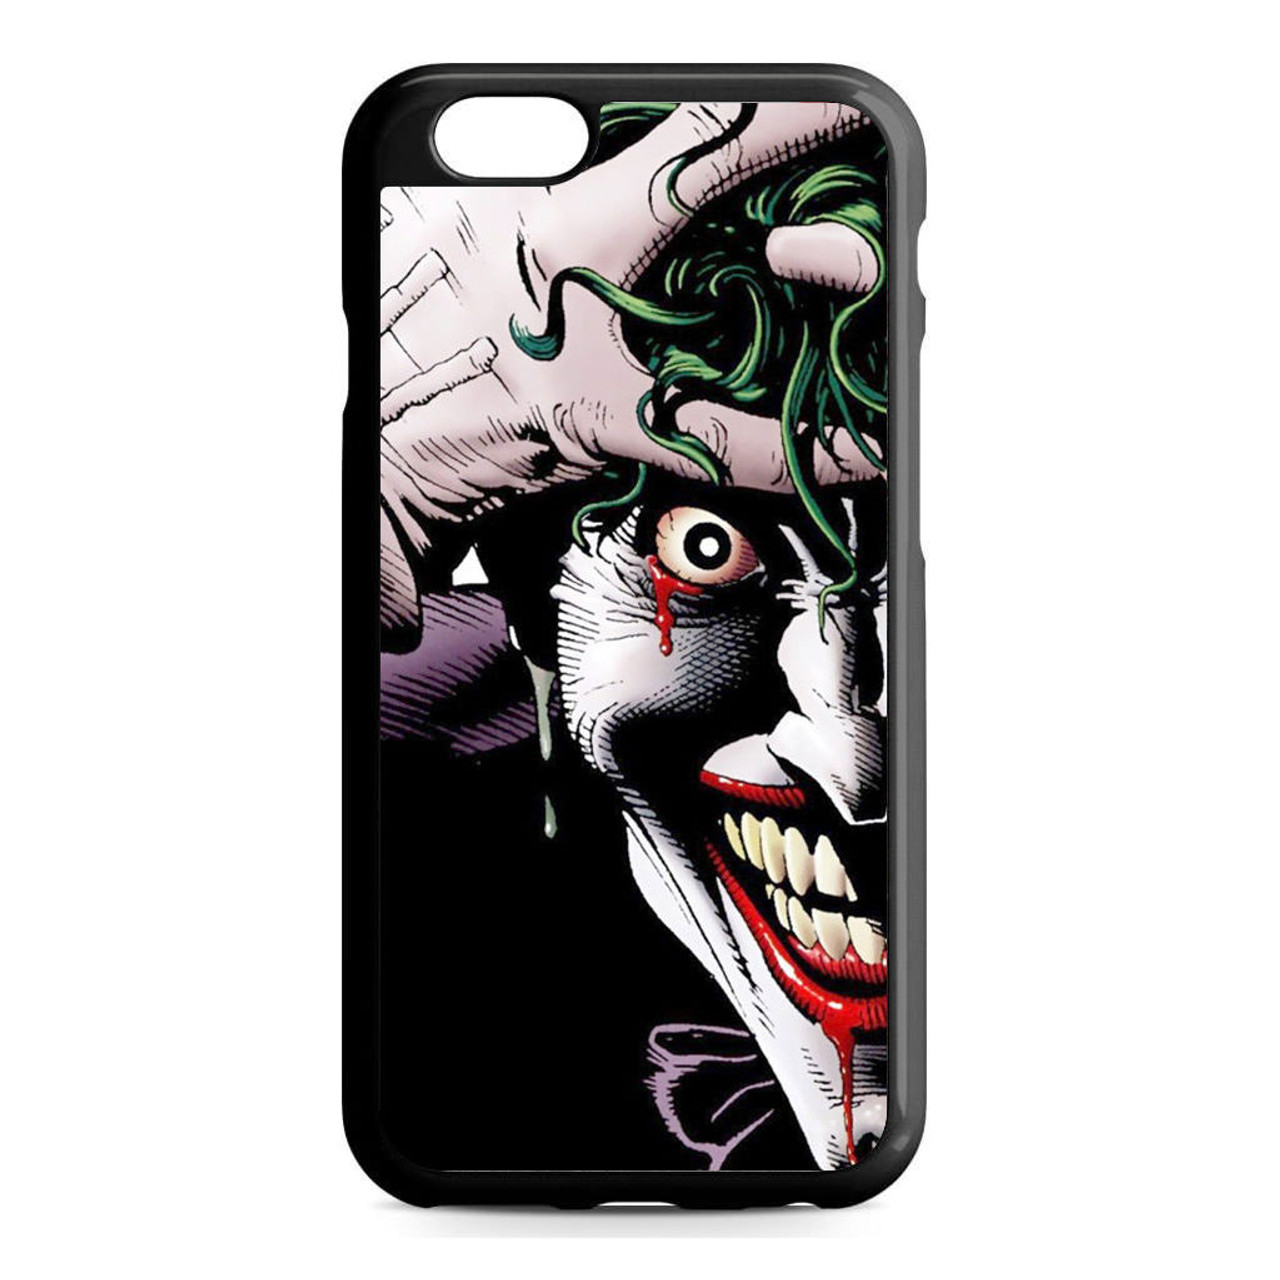 joker phone case iphone 6s